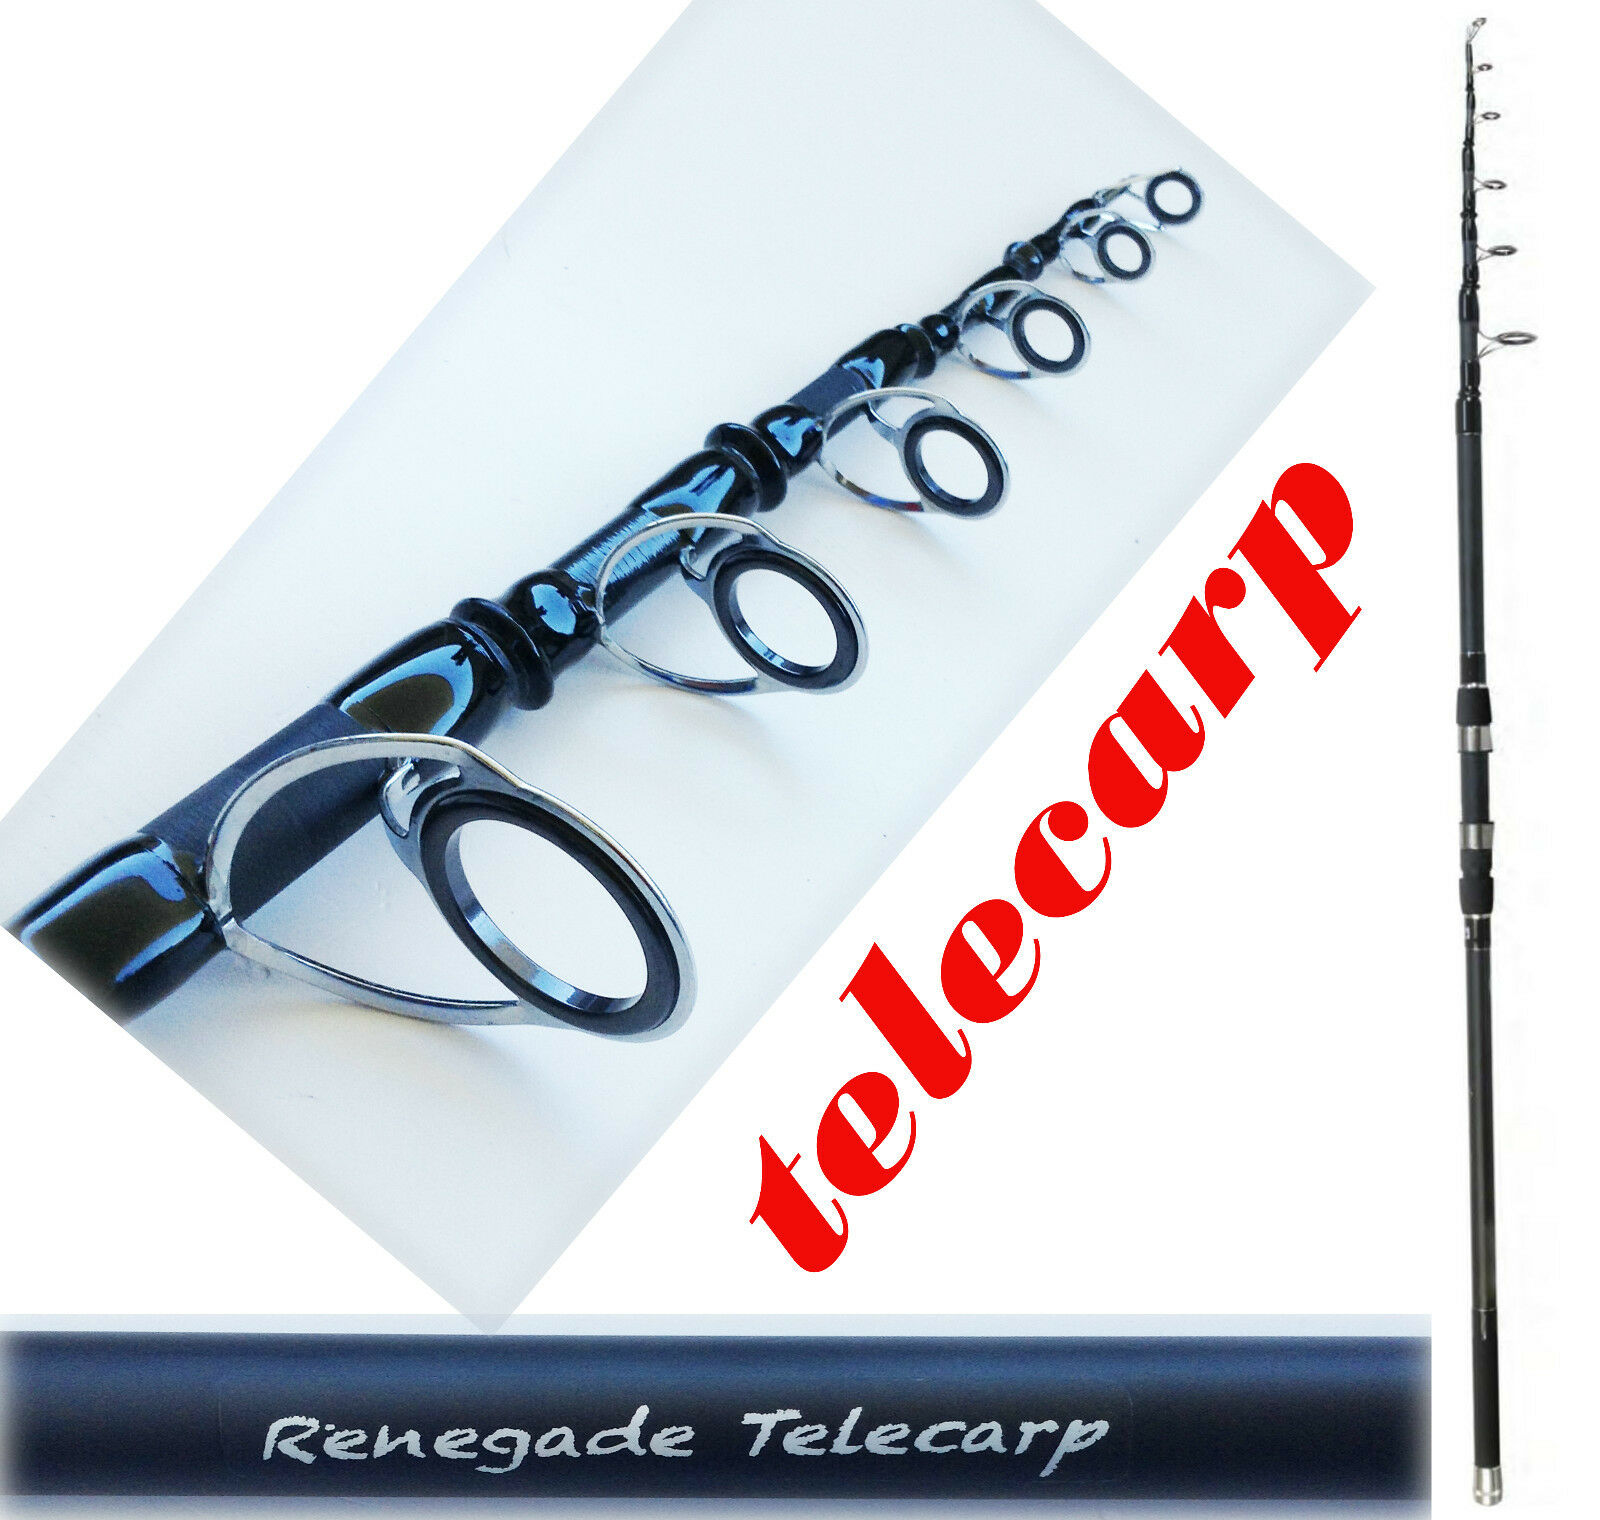 Canna carpfishing storione carpa pesca fondo 3 libre milo renegade telescopica